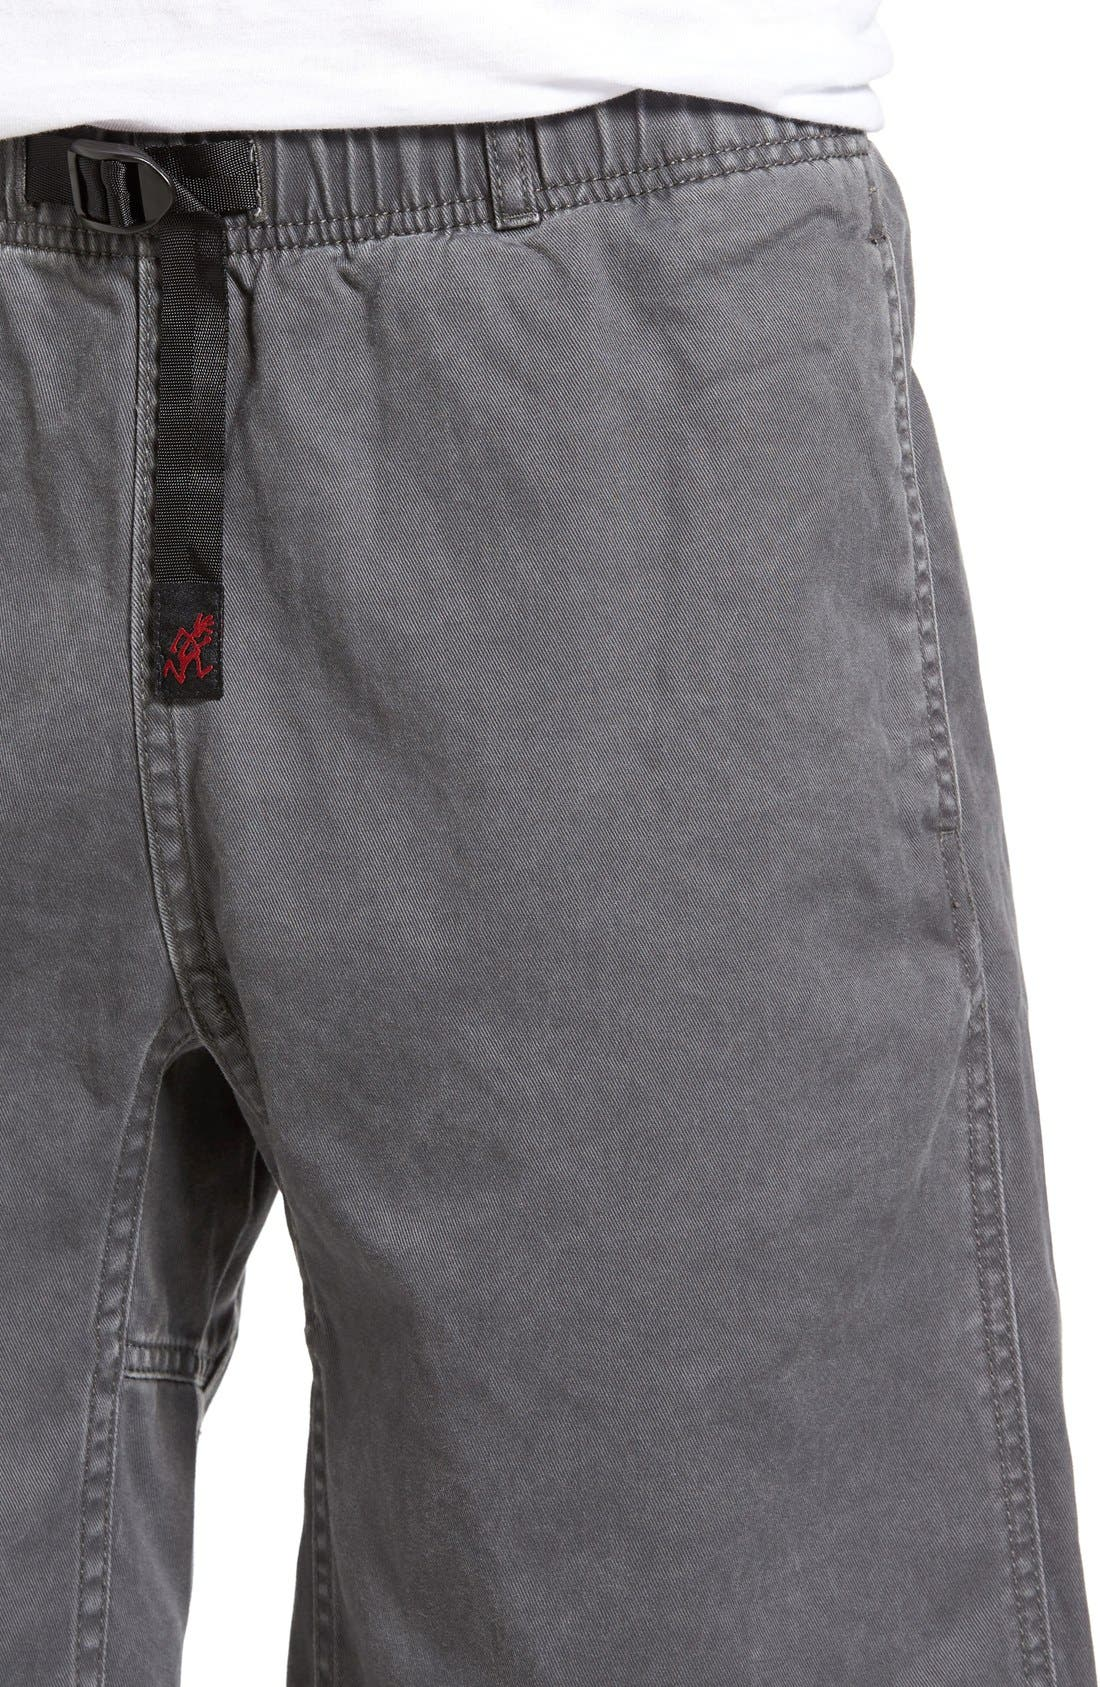 Rockin Sport Shorts,                             Alternate thumbnail 4, color,                             Asphalt Grey